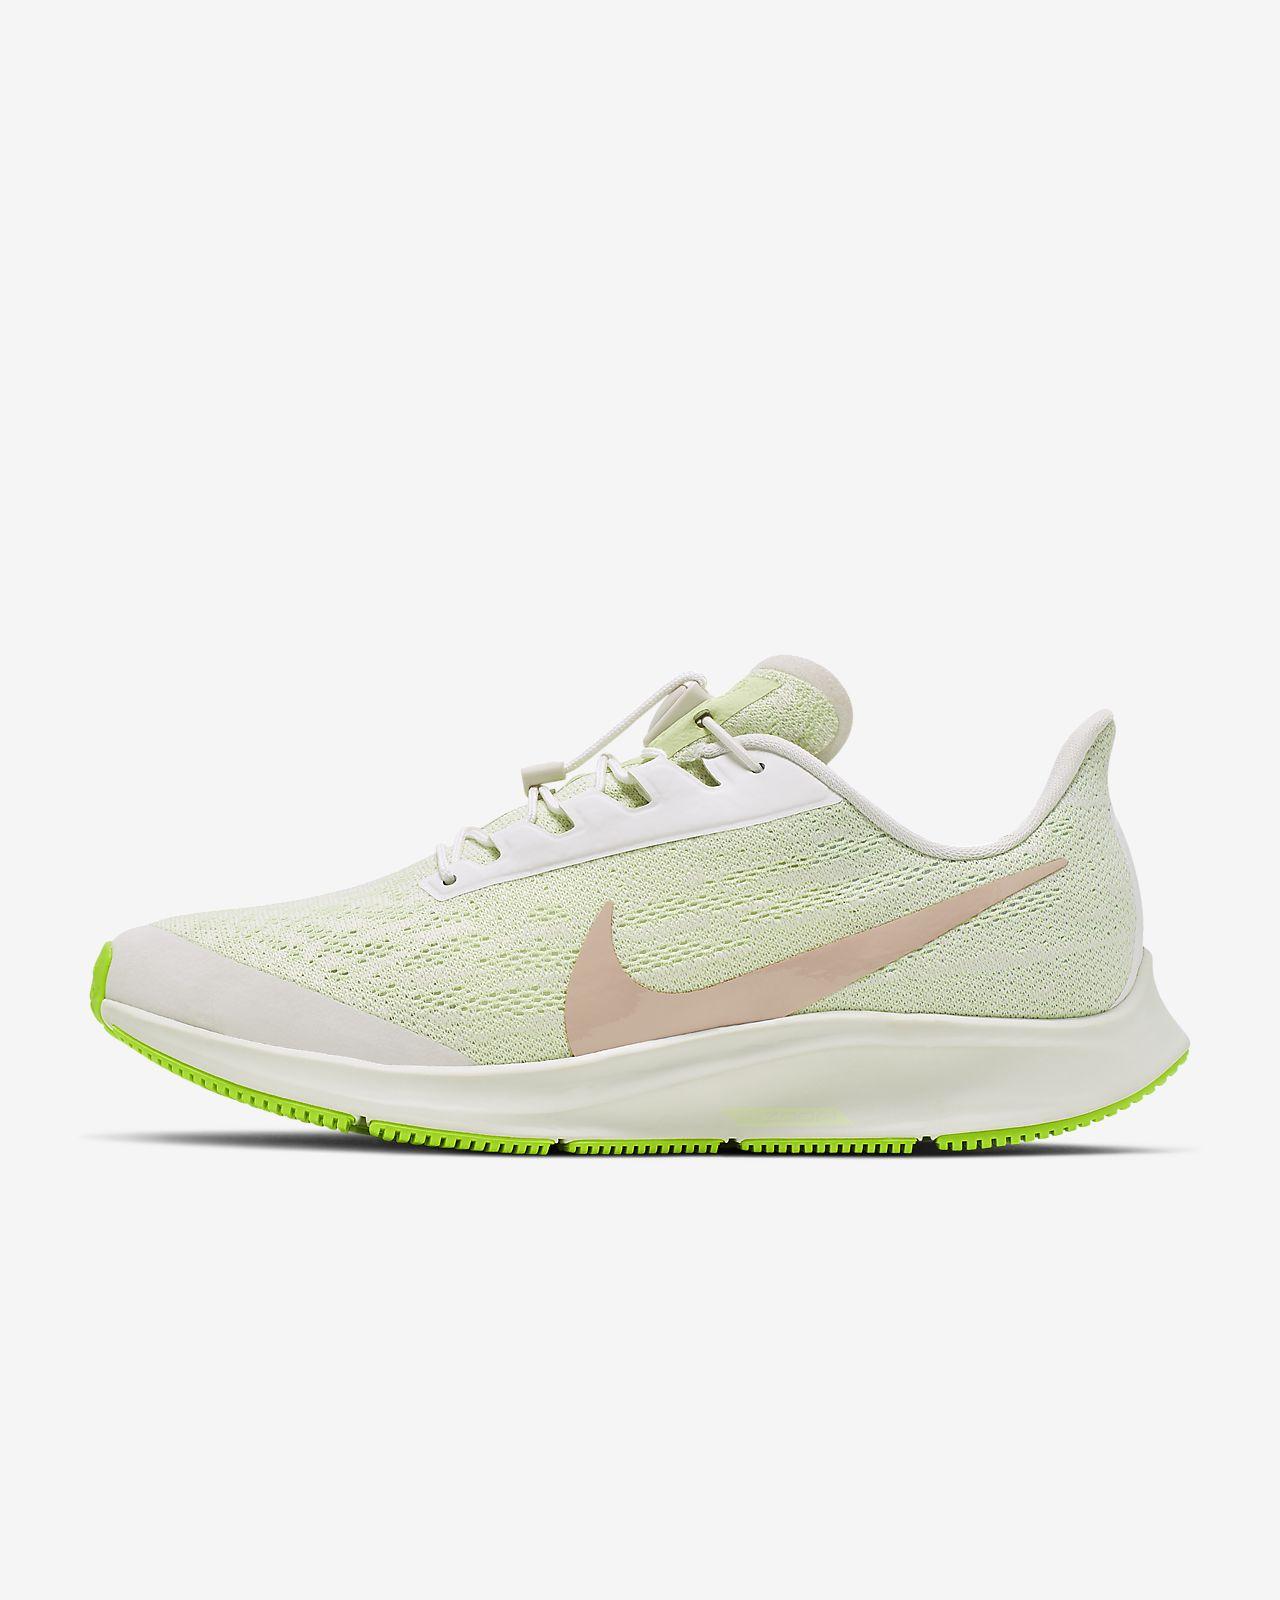 Chaussure de running Nike Air Zoom Pegasus 36 FlyEase pour Femme